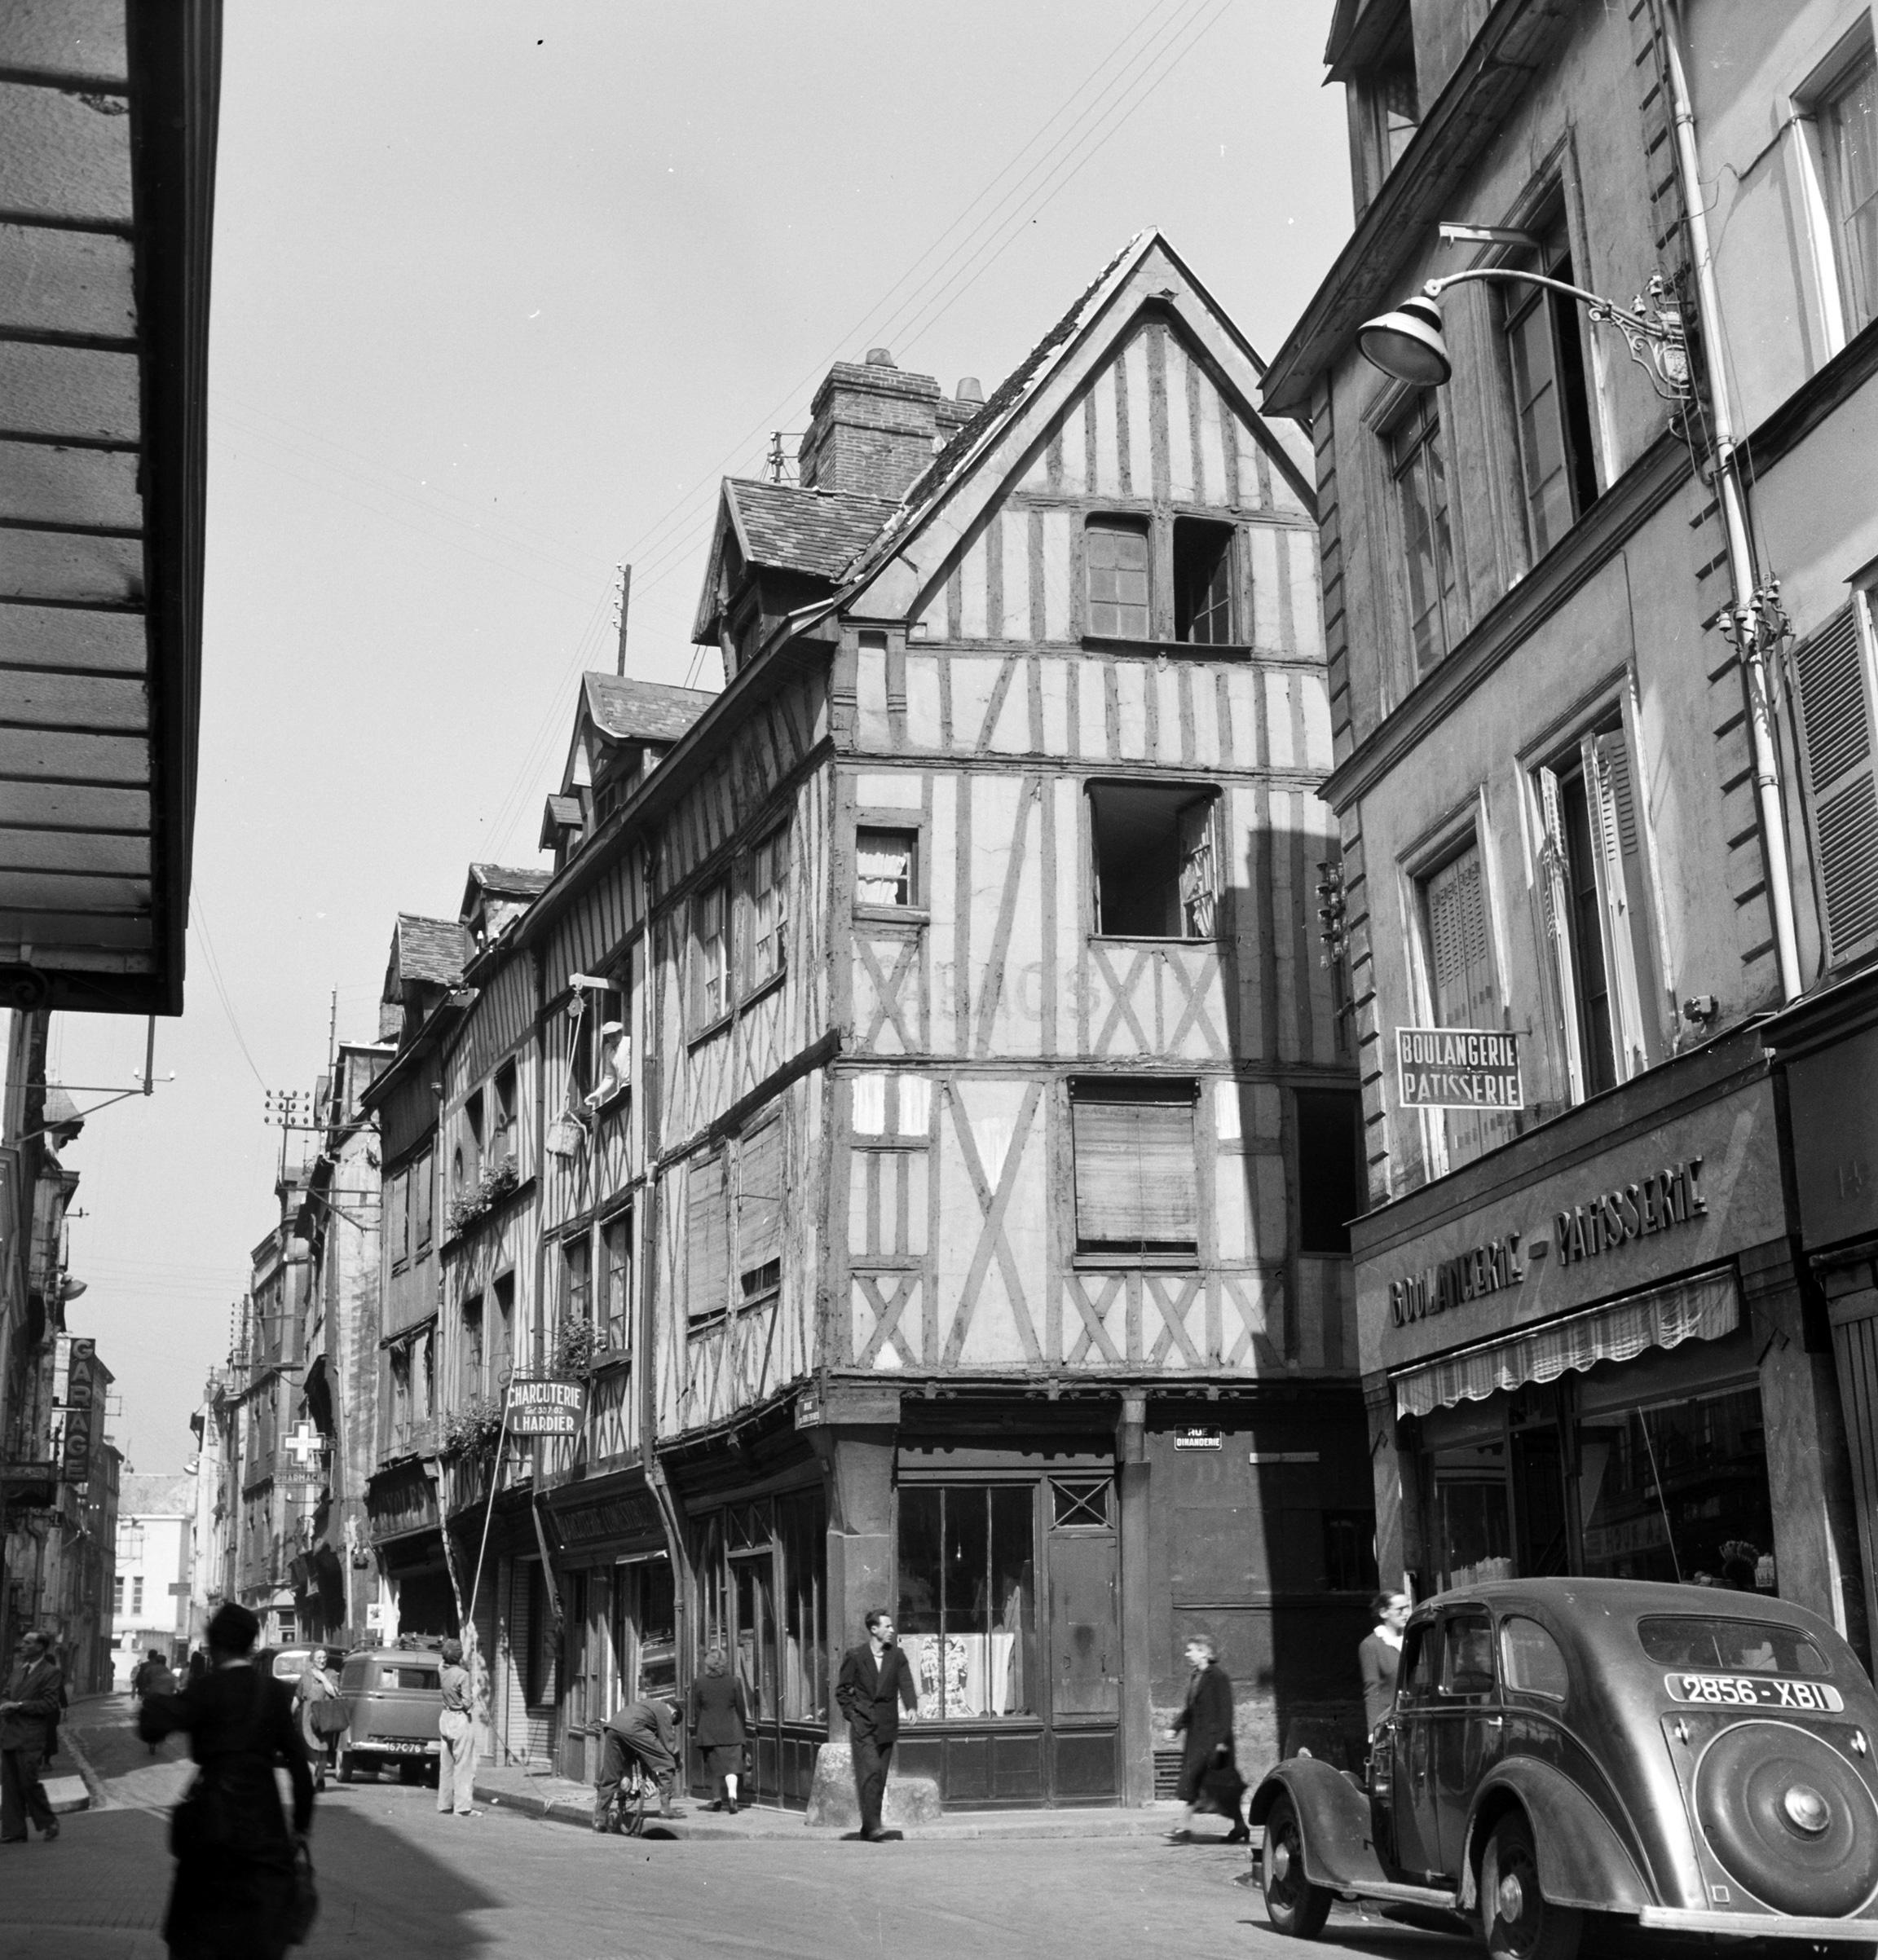 Corner house, Rouen, 1951.